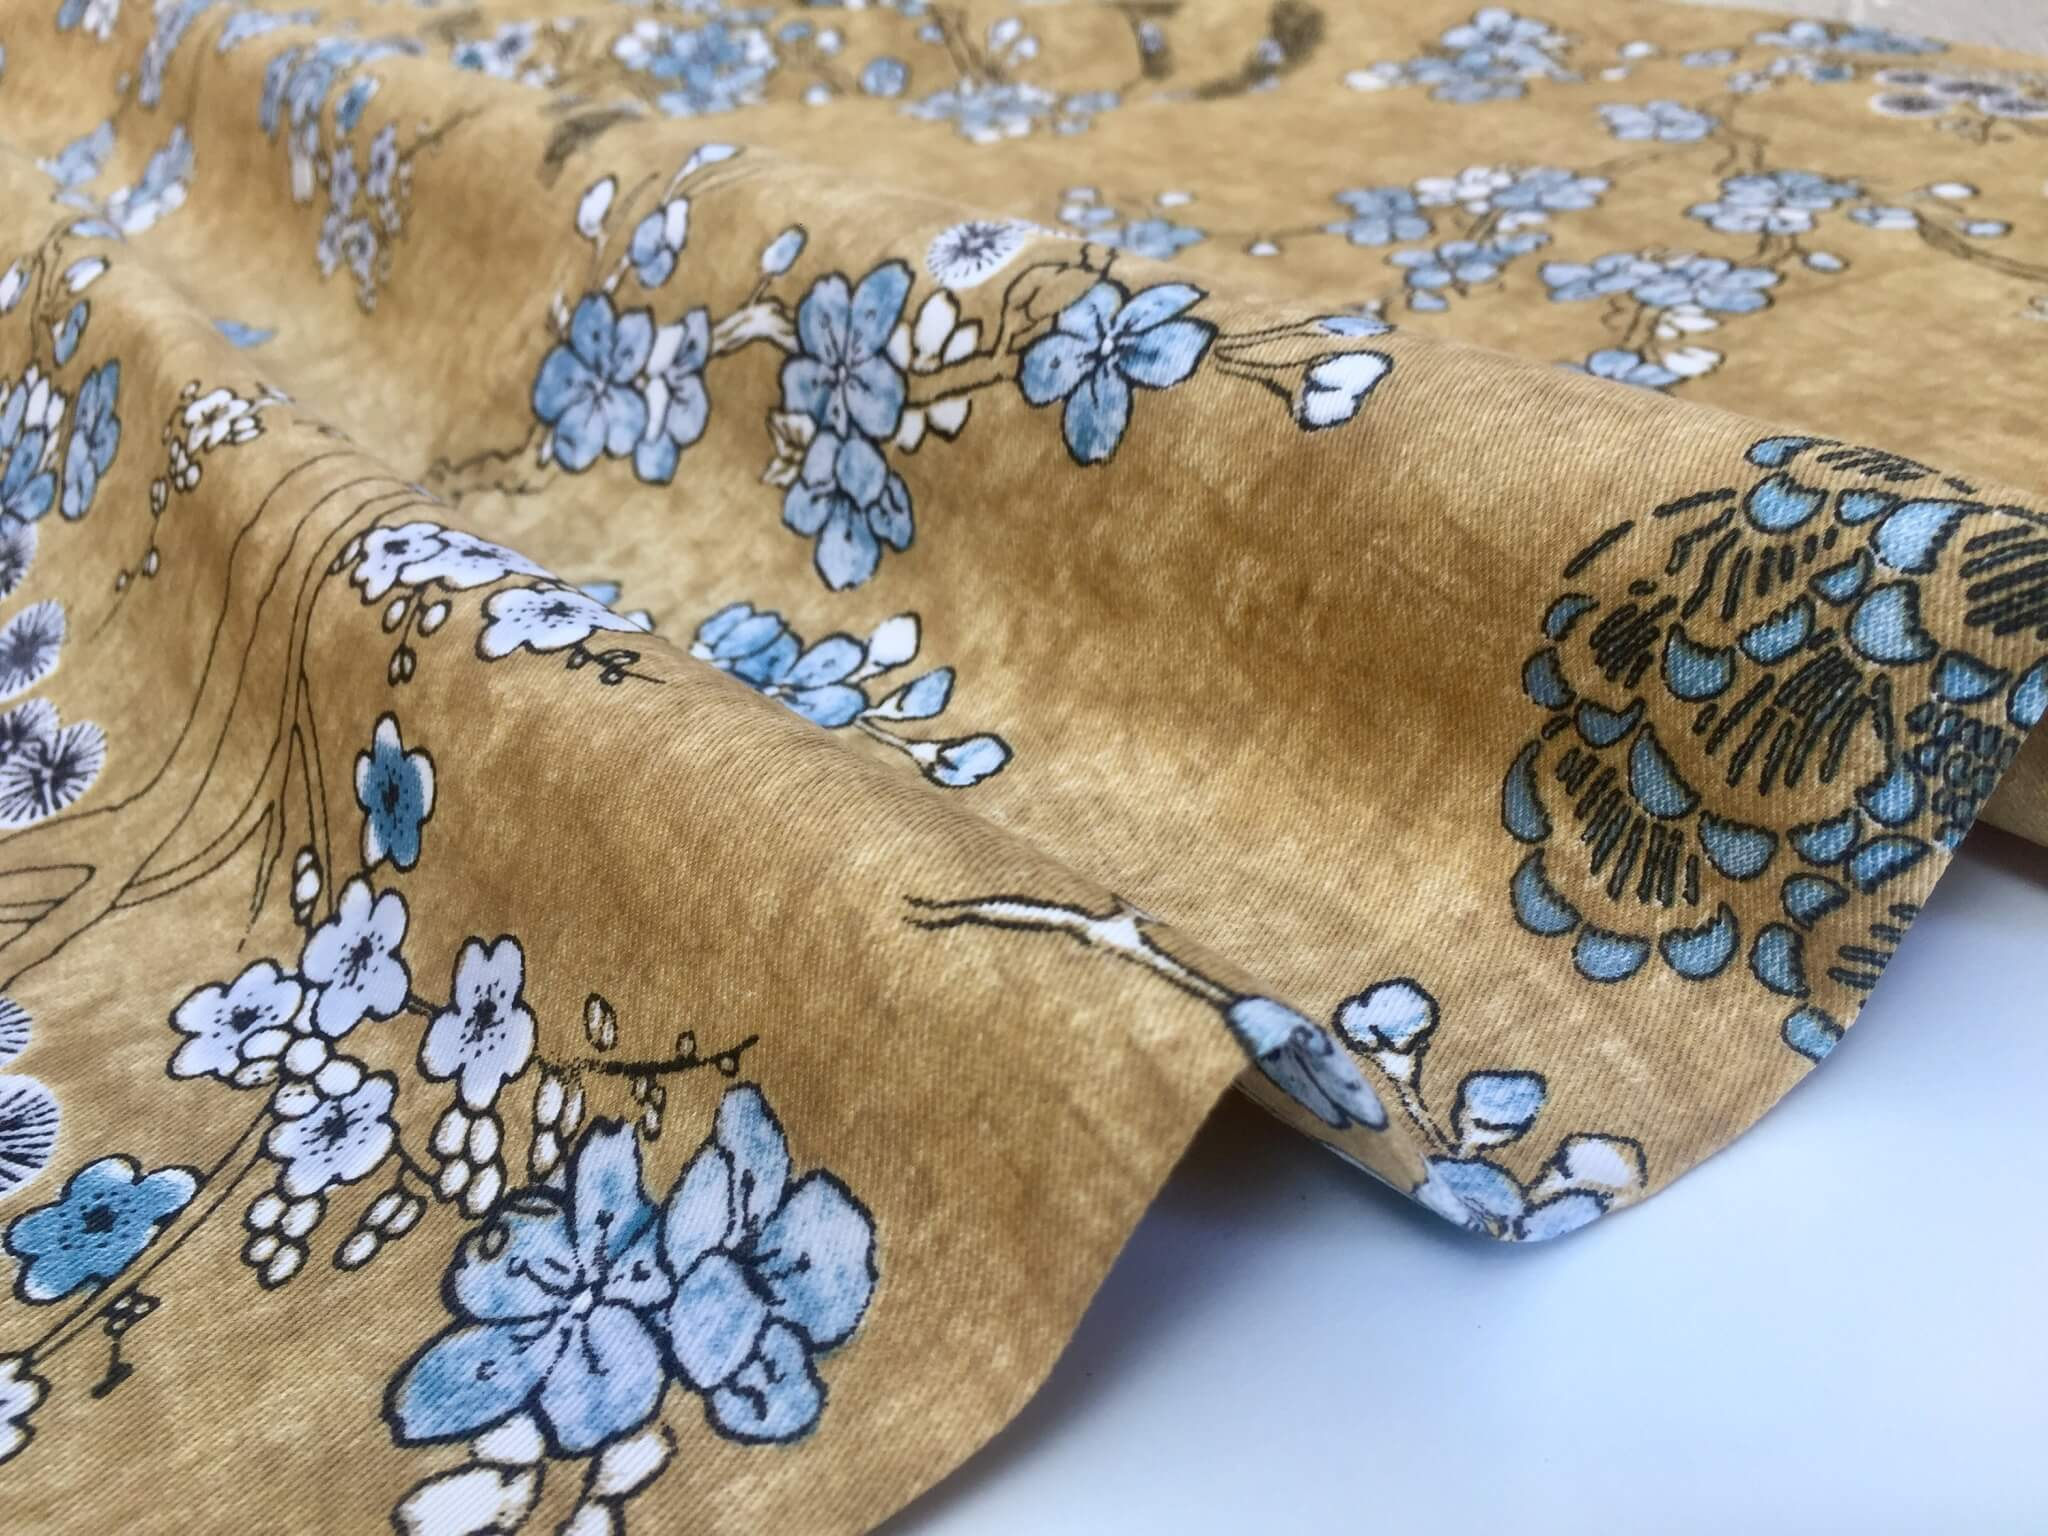 japanese-sakura-blossom-cherry-floral-twill-curtain-fabric-oriental-furnishing-material-110-extra-wide-textile-mustard-blue-5c1fceae1.jpg